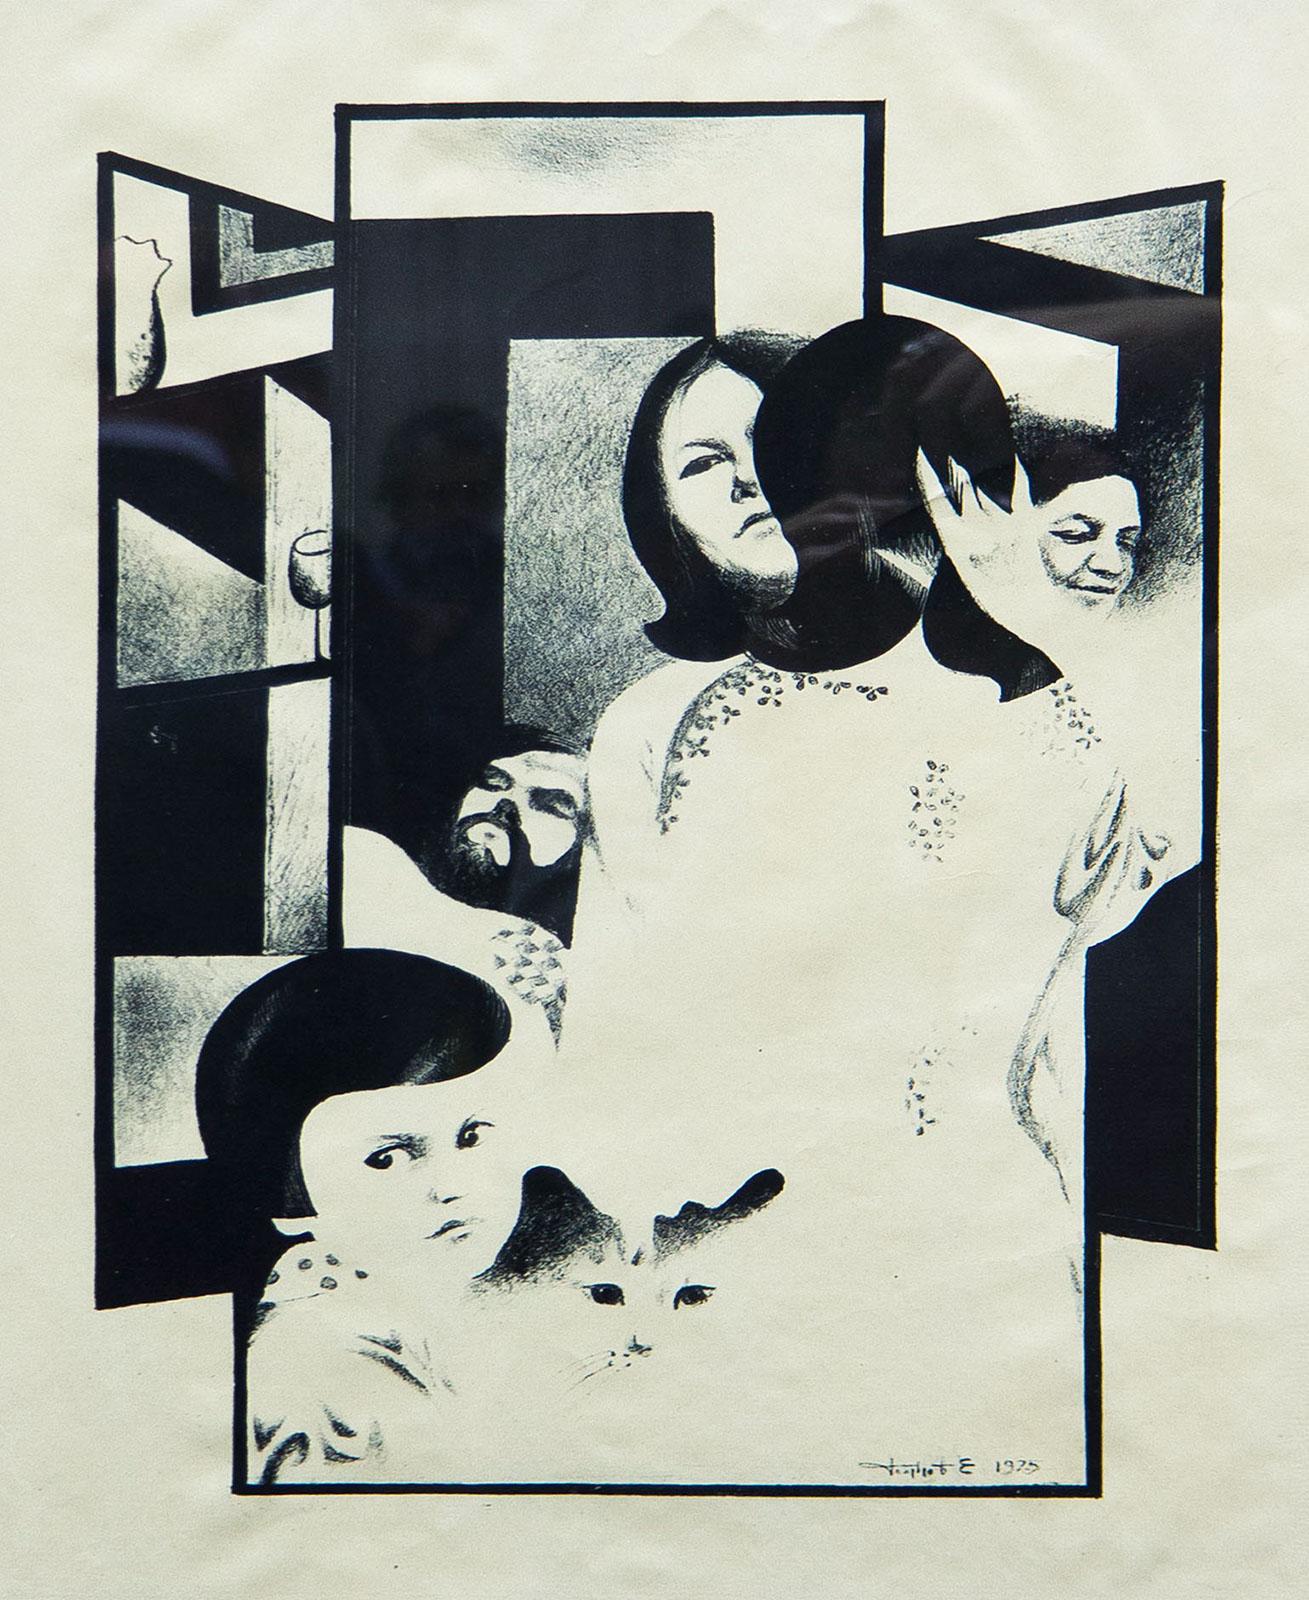 Фото №89466. Моя семья. 1975. Голубцов Е.Г. 1949